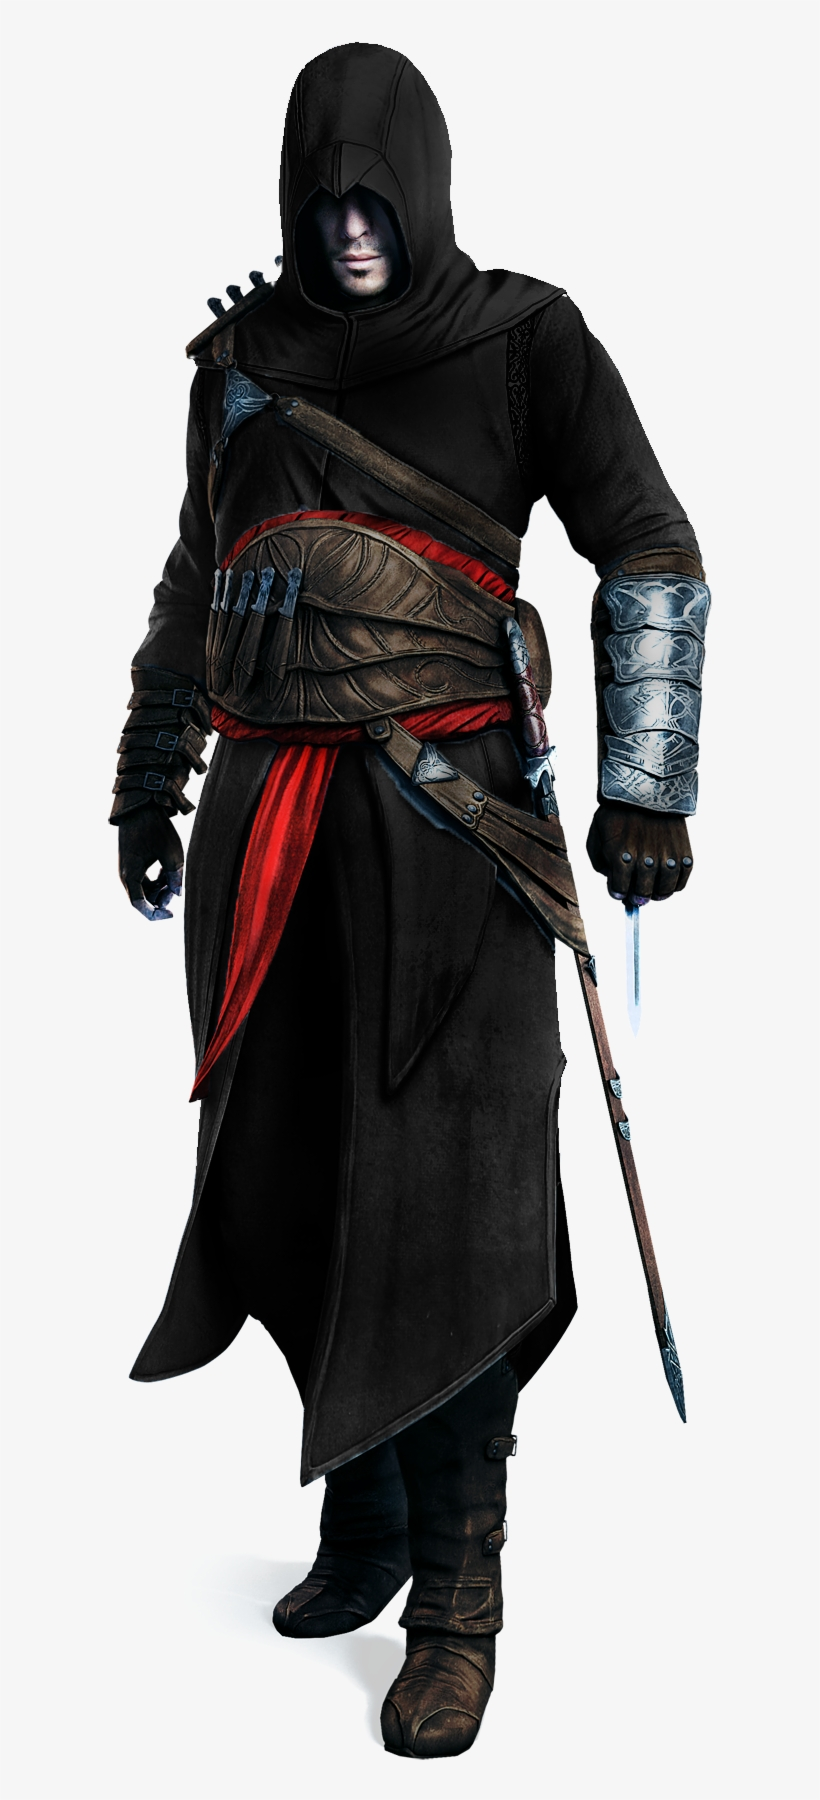 Altair Ac Revelations Render Assassins Creed Keep Calm